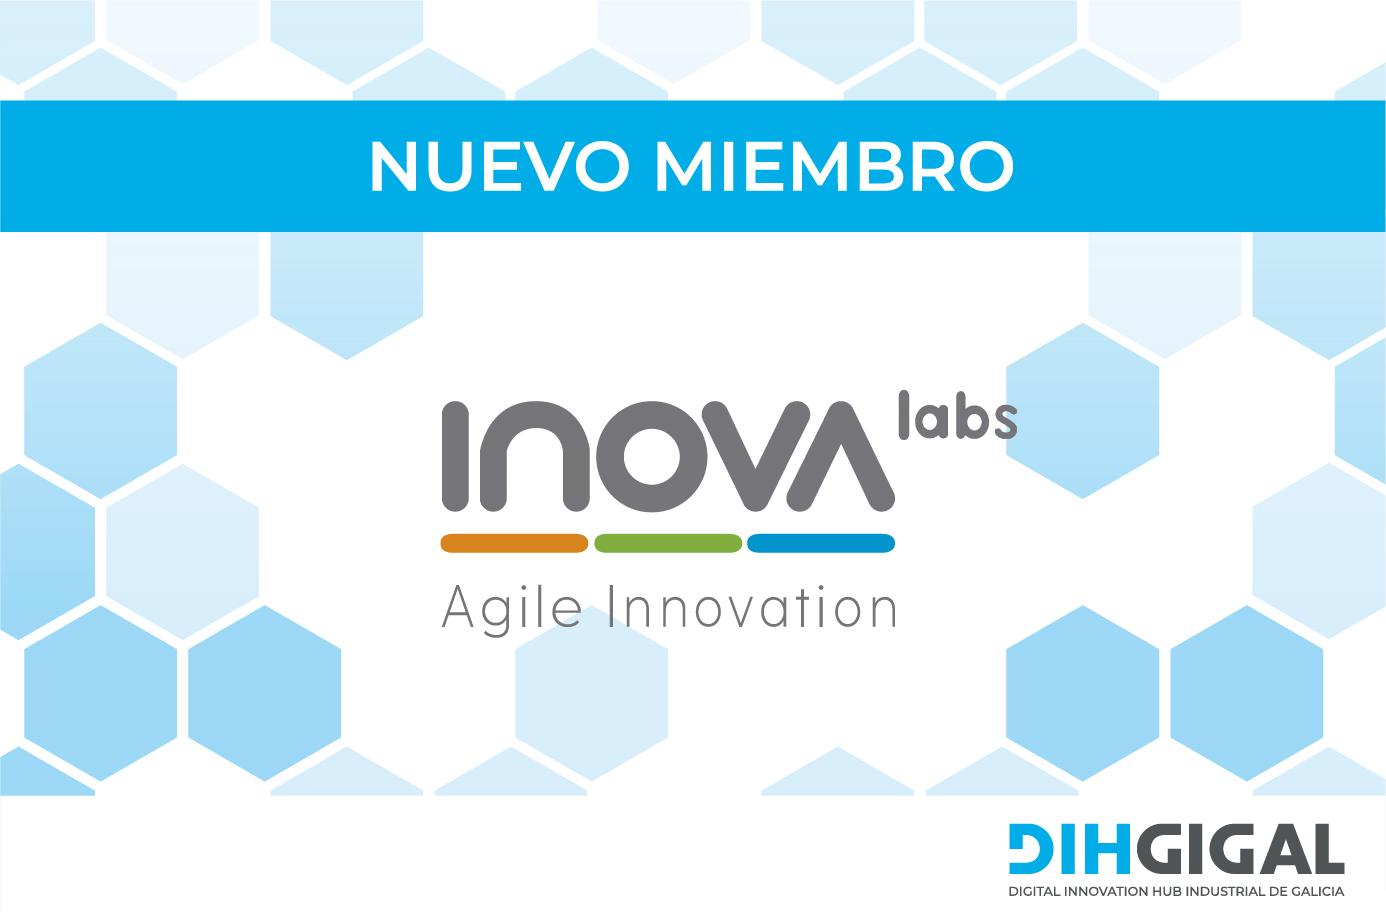 Inova labs_nuevomiembro_DIHGIGAL